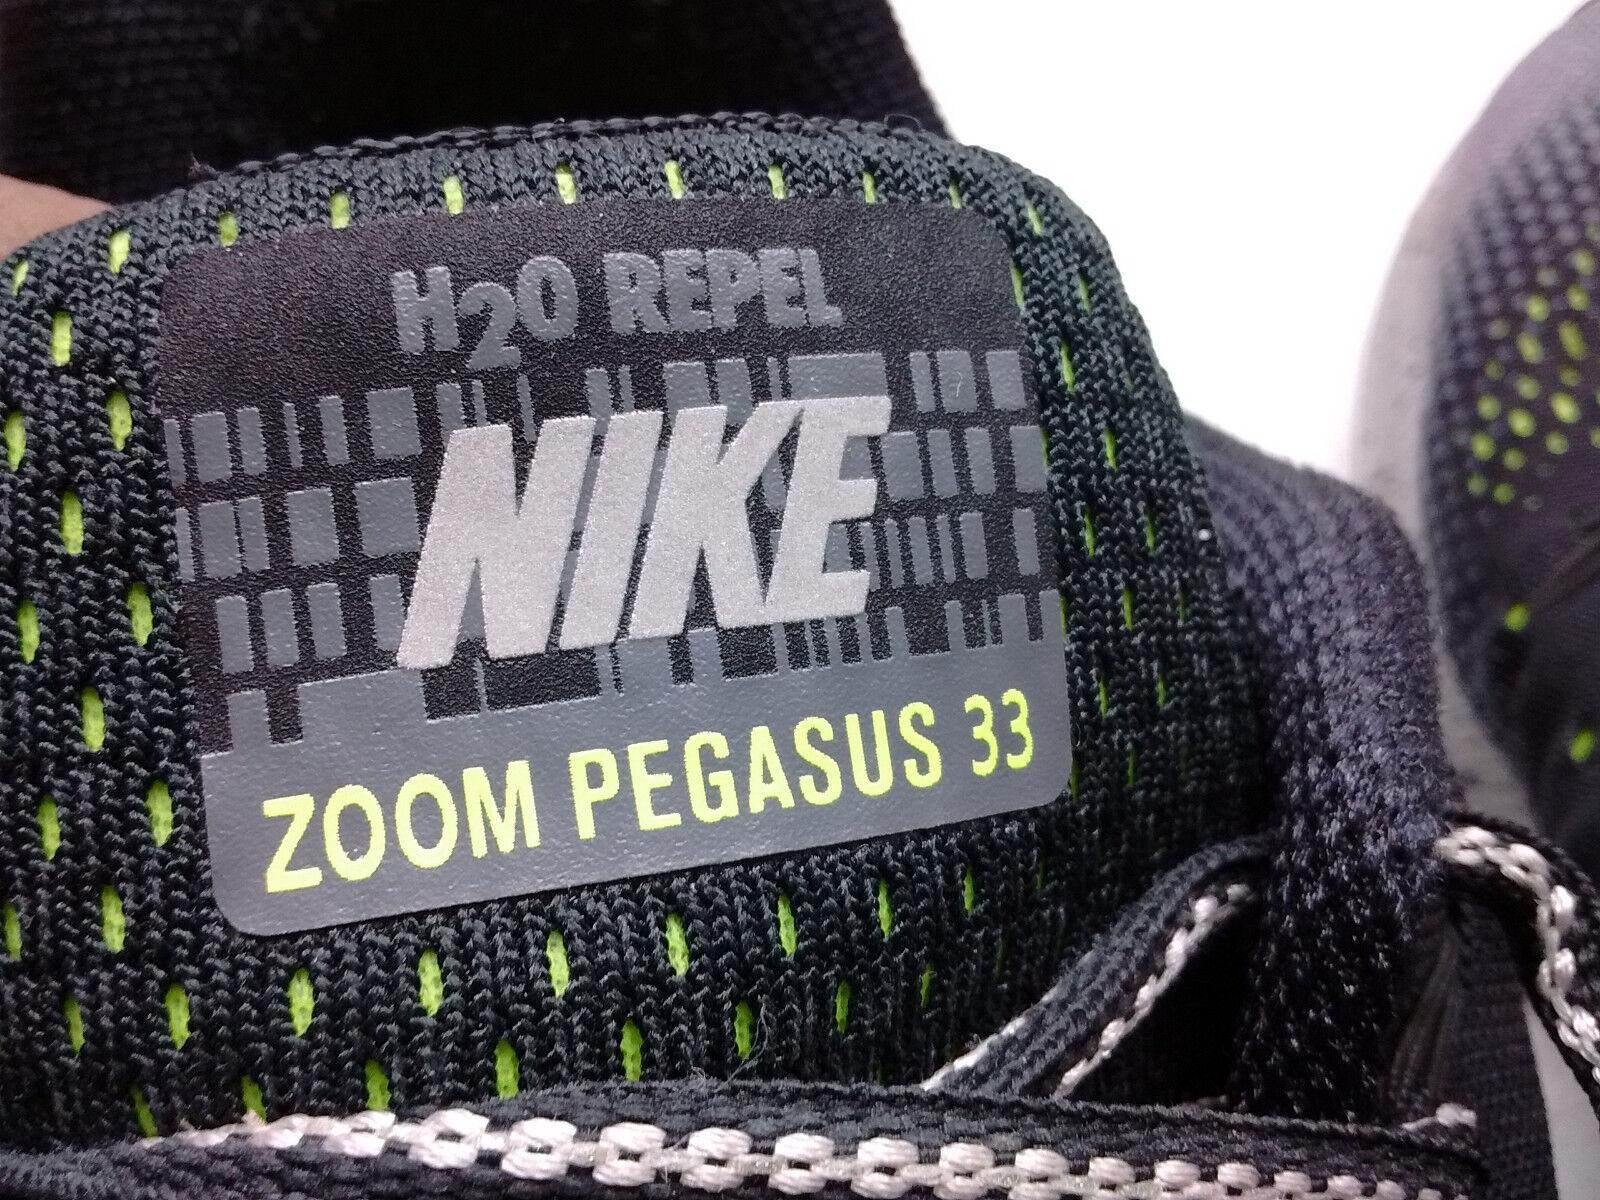 Nike Zoom Pegassus 33 33 33 Black Mesh Athletic Sneakers Lace Running Men shoes 12M 46 556721